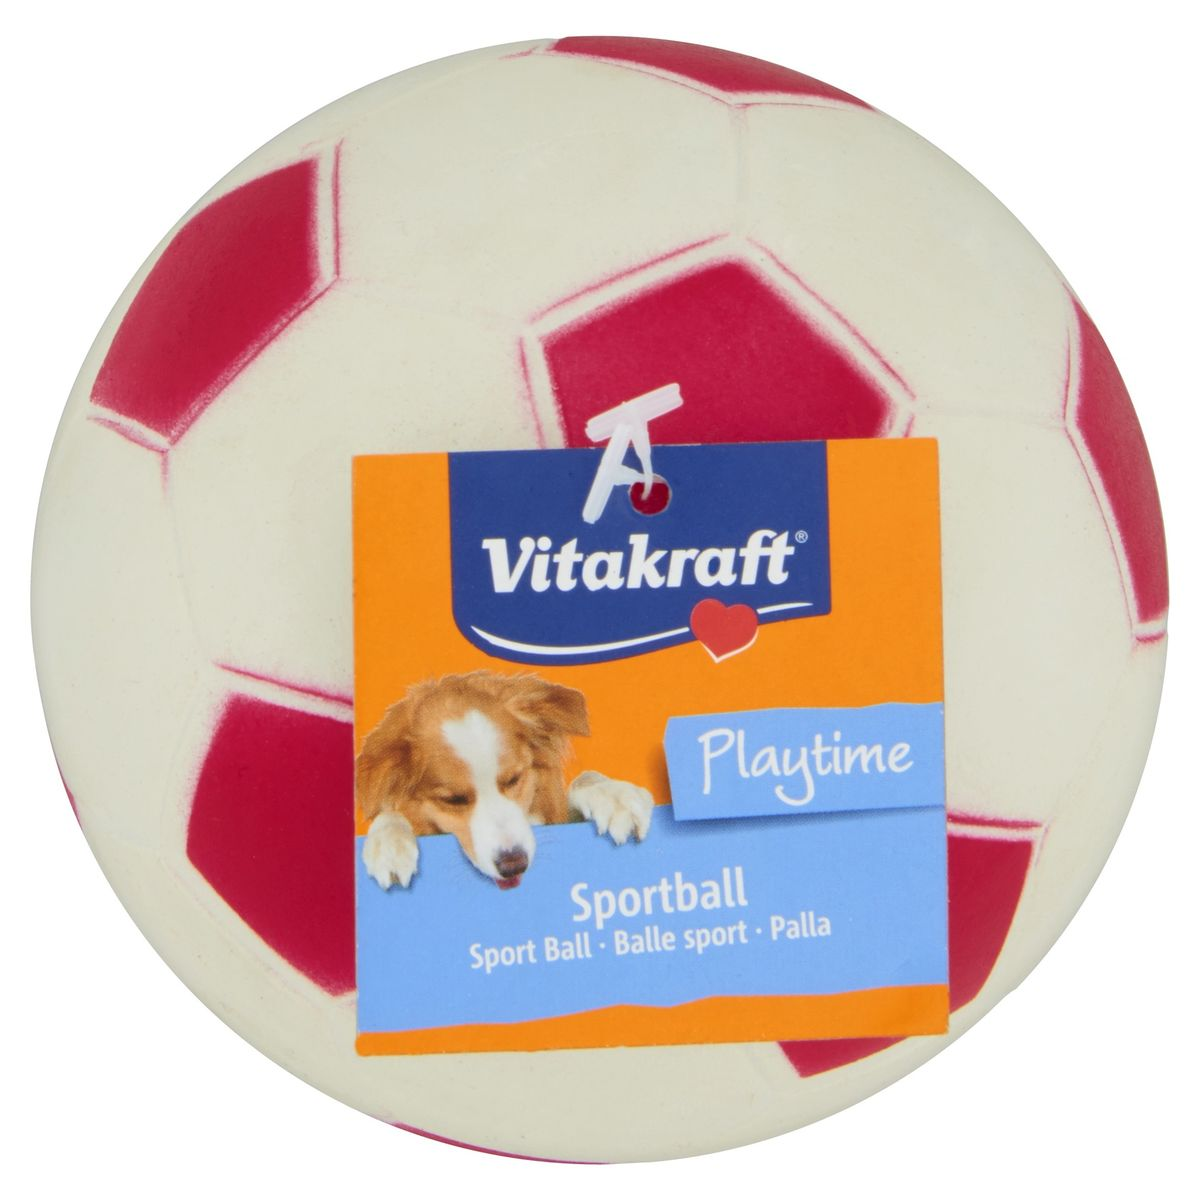 Vitakraft Playtime Sport Ball